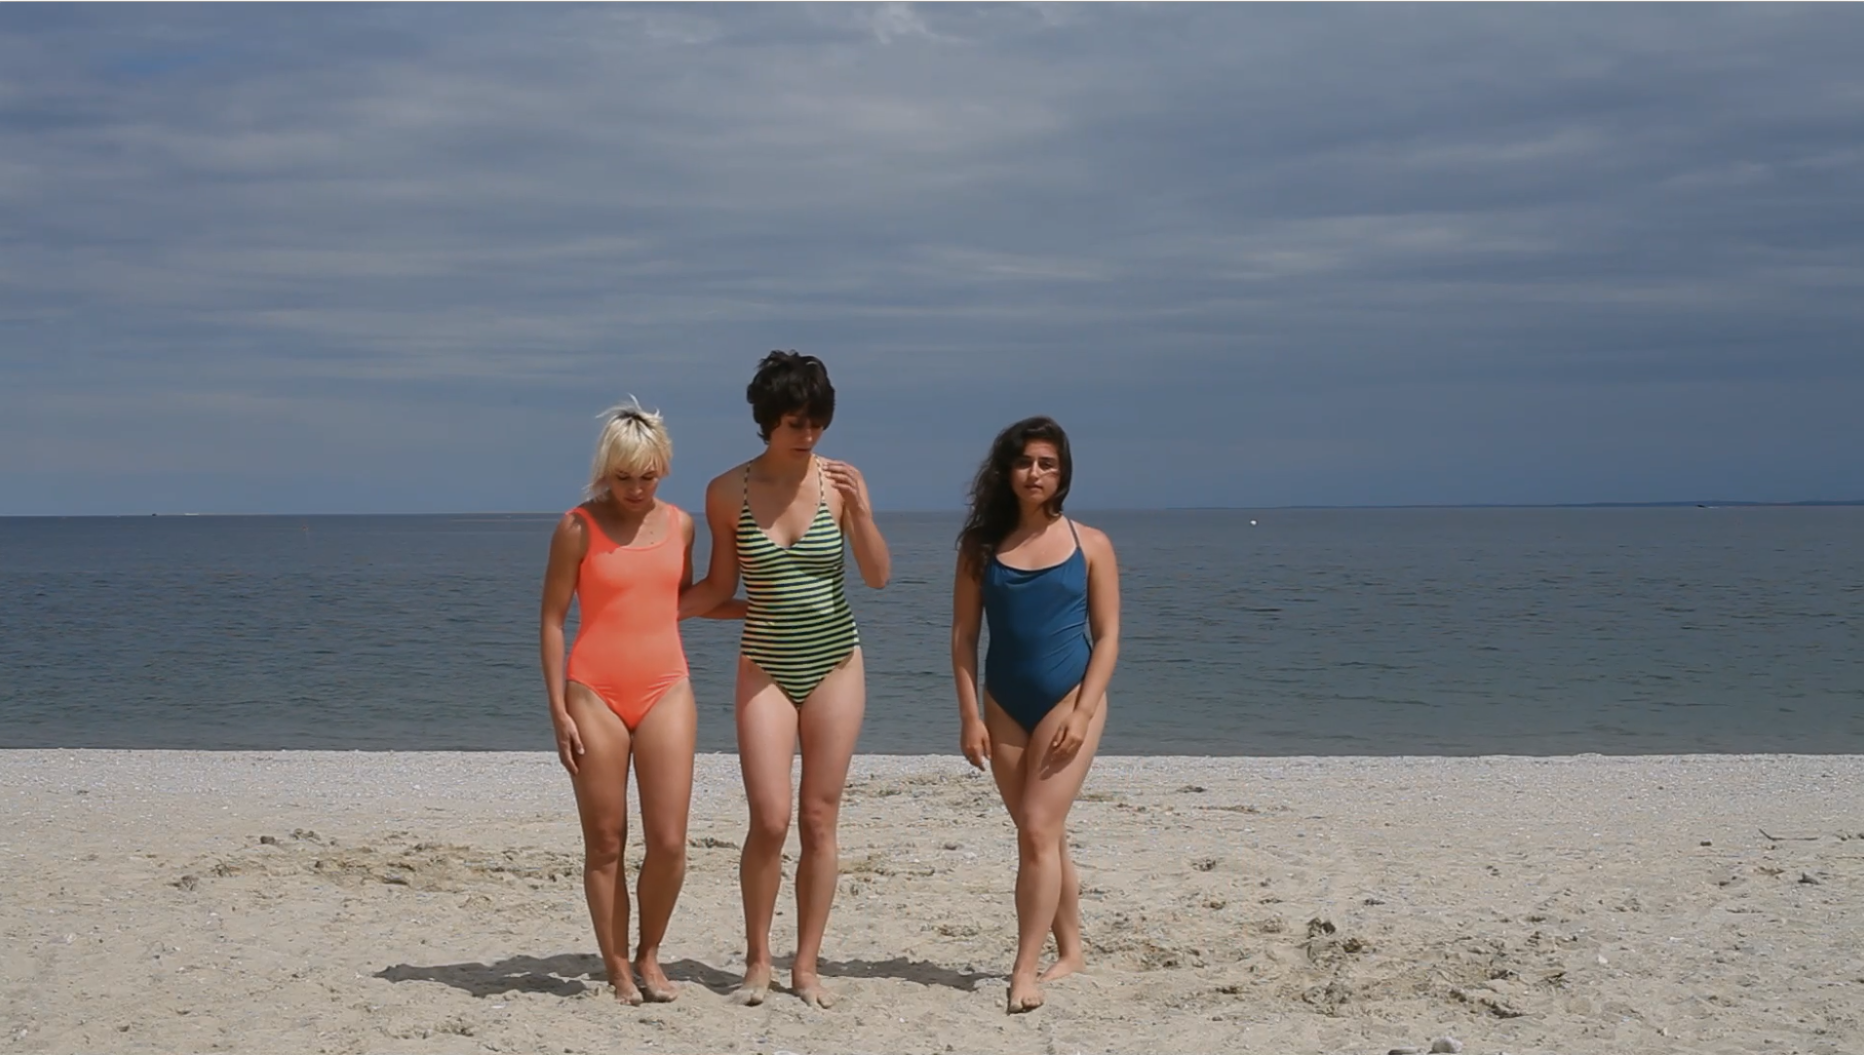 Distant Anchors - Lola Lola Dance Co.Sound Design, Music | Film